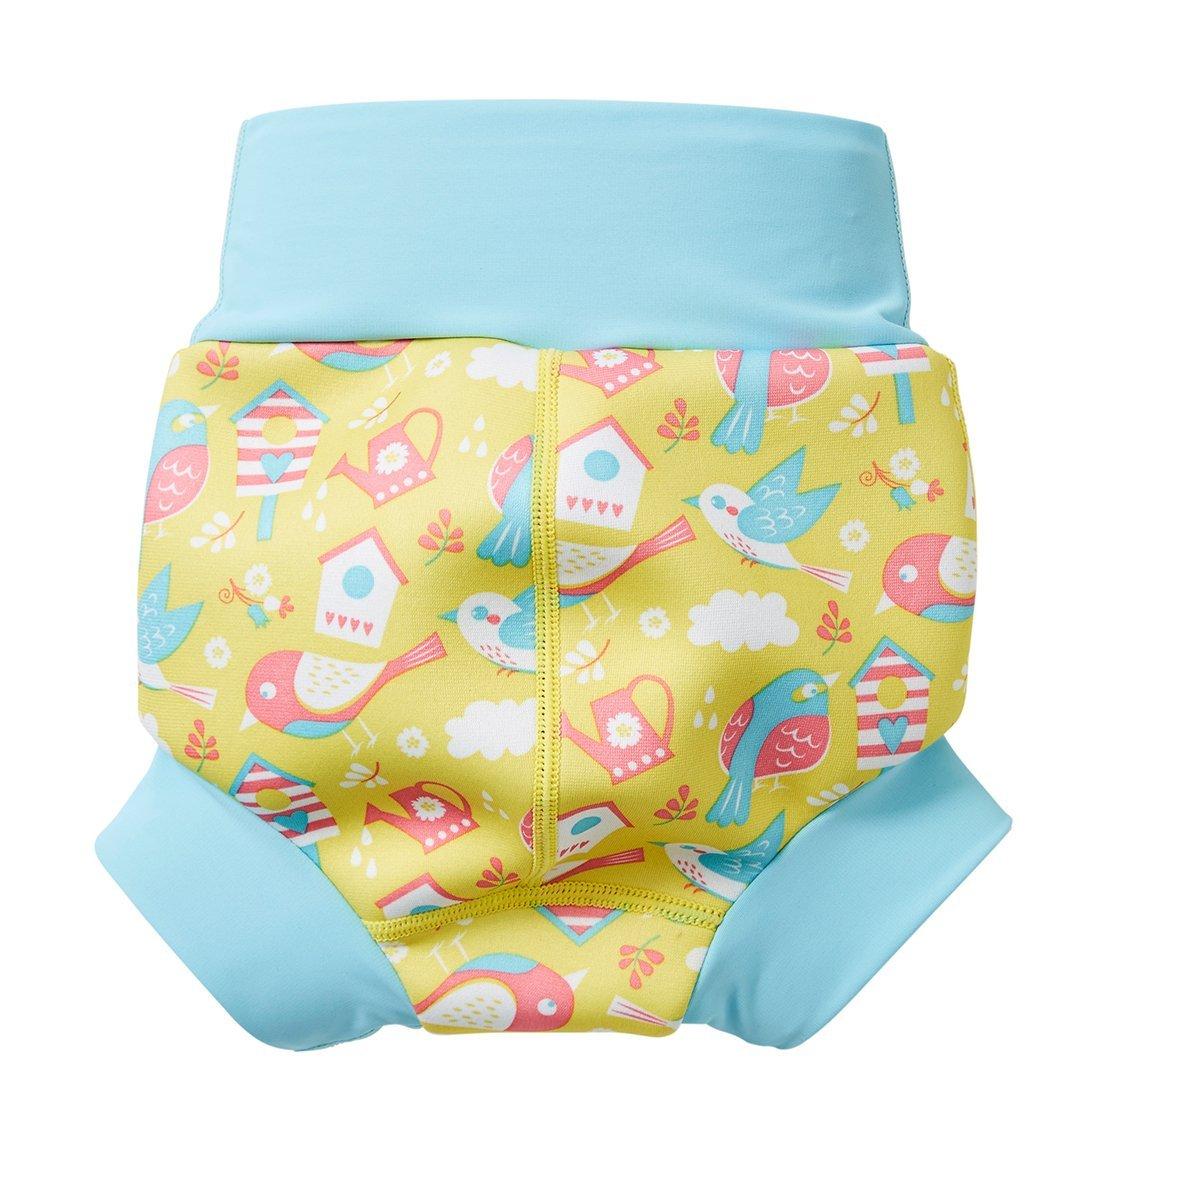 Splash-About-Happy-Nappy-Baby-amp-Toddler-Swimwear-Nappy-and-Shorts-Sun-Safe thumbnail 13